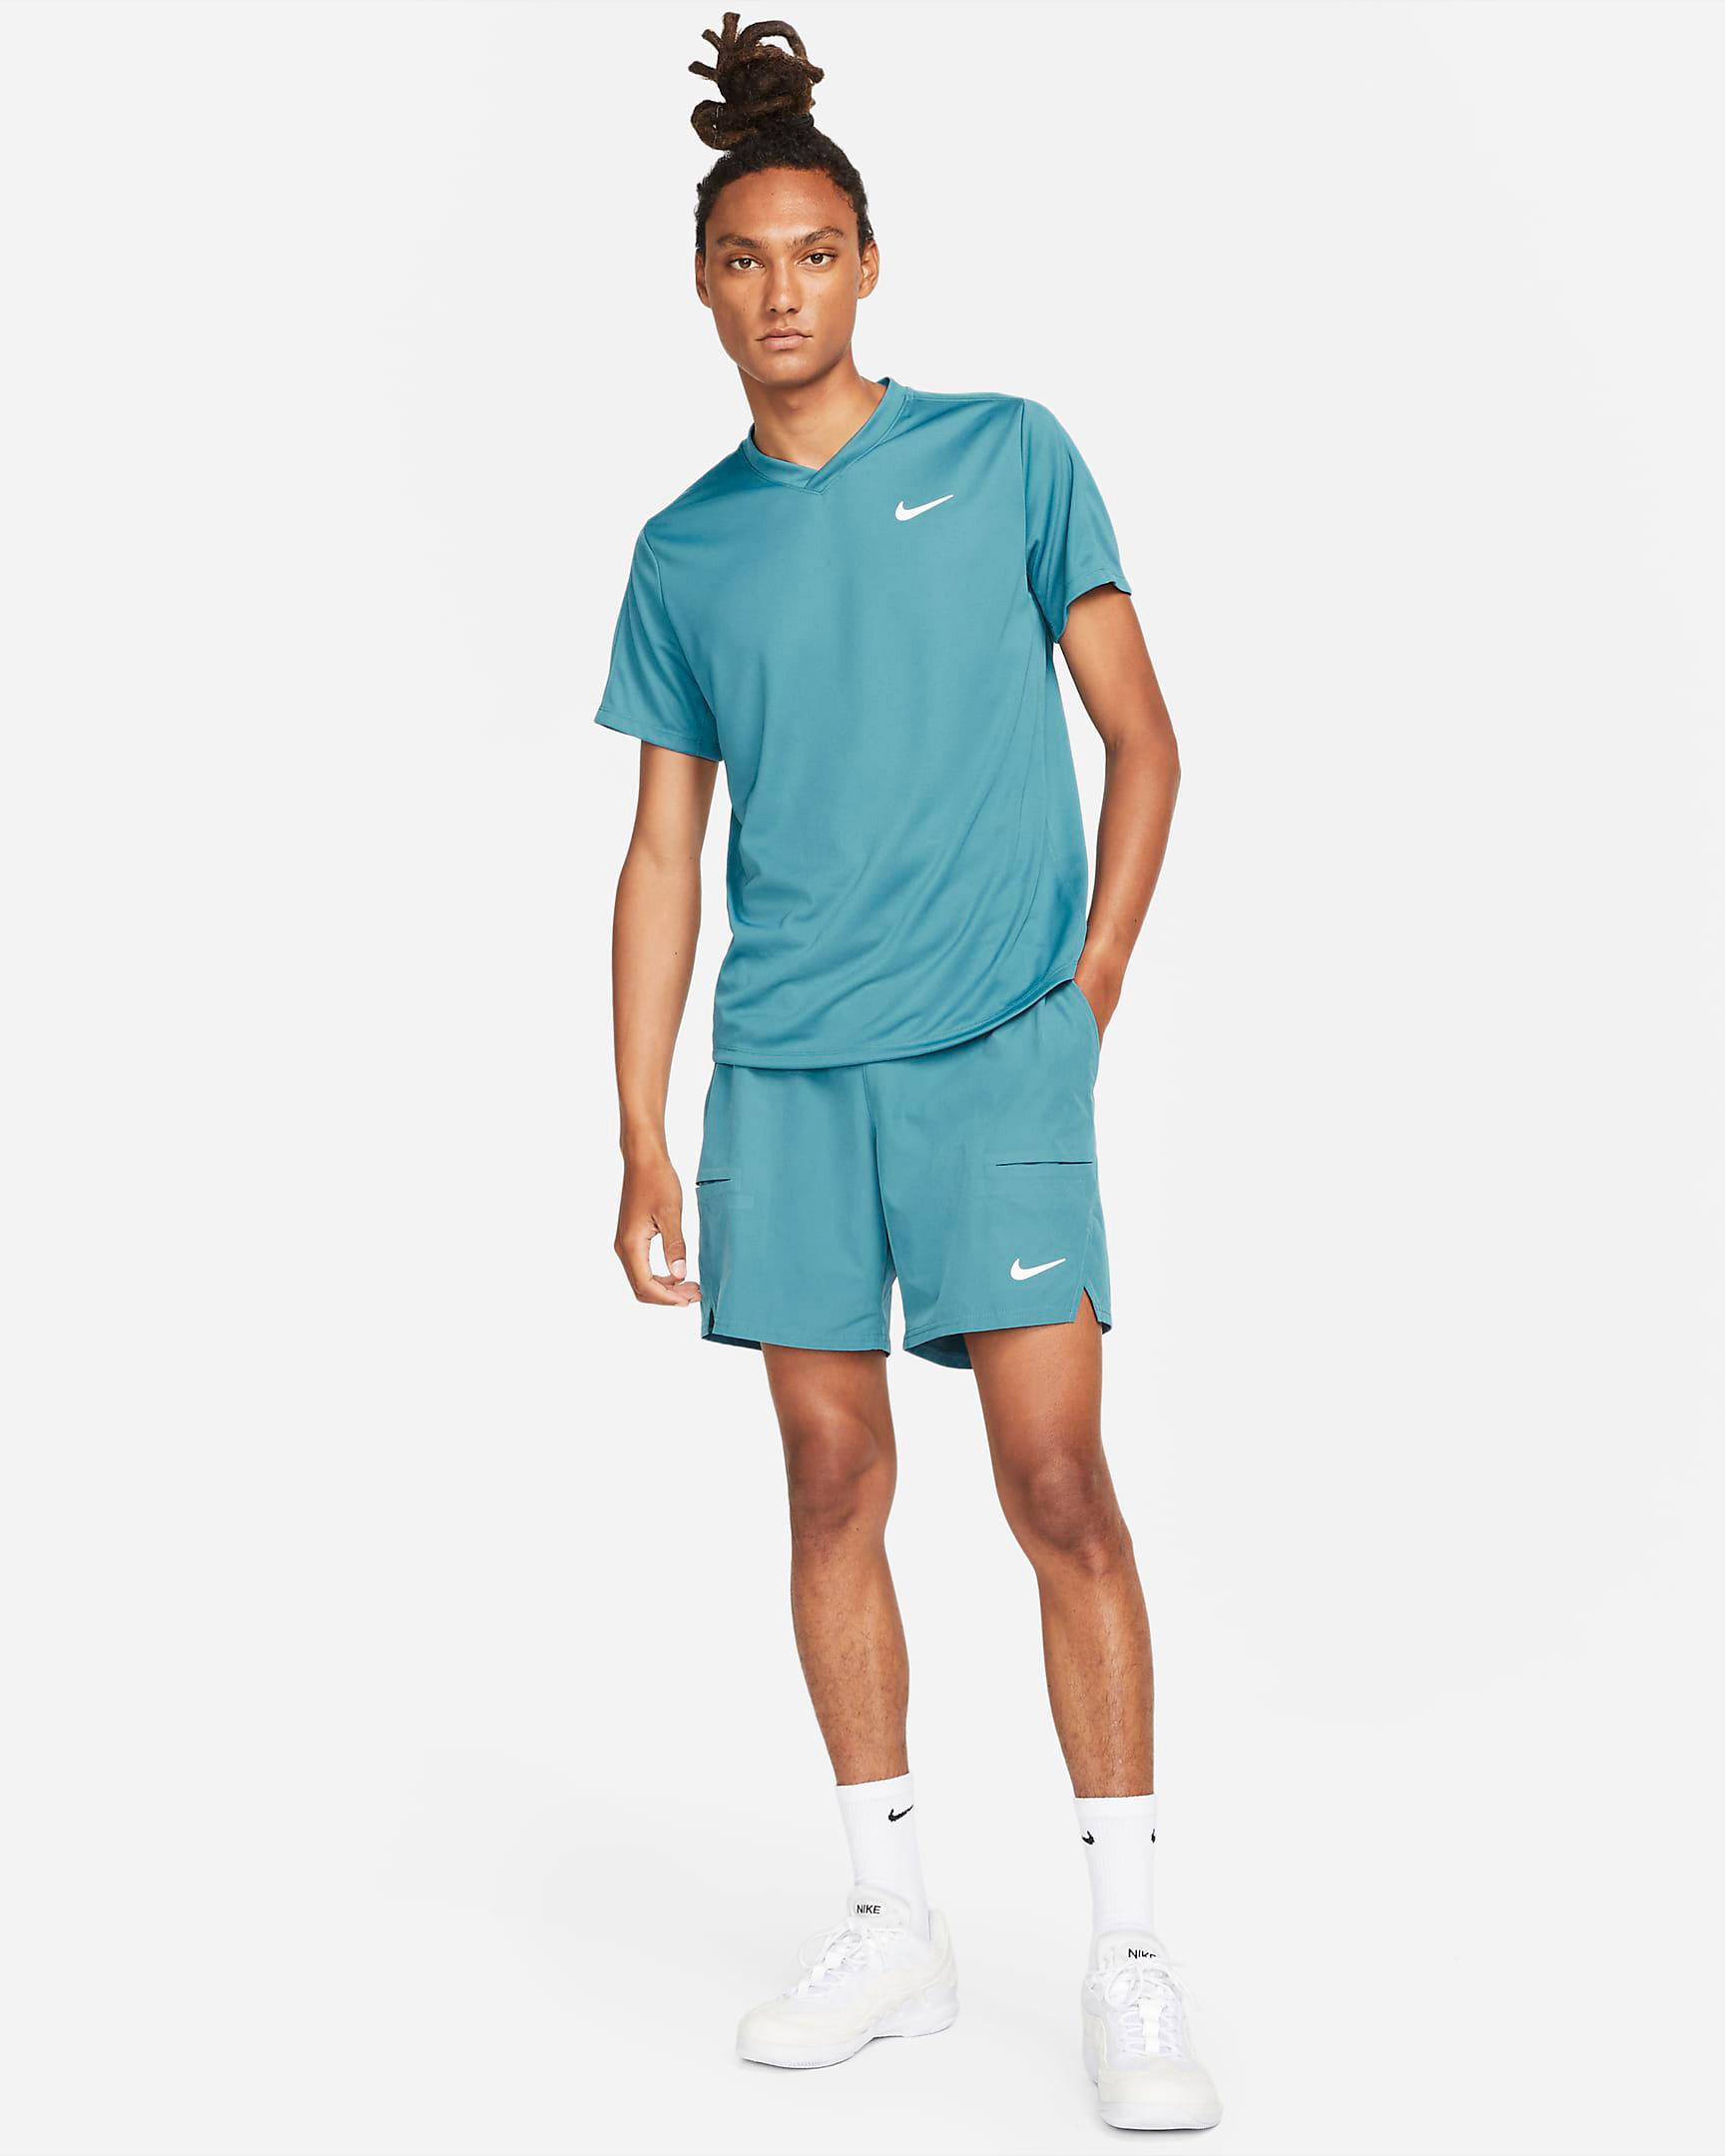 nike-rift-blue-tennis-shirt-shorts-outfit